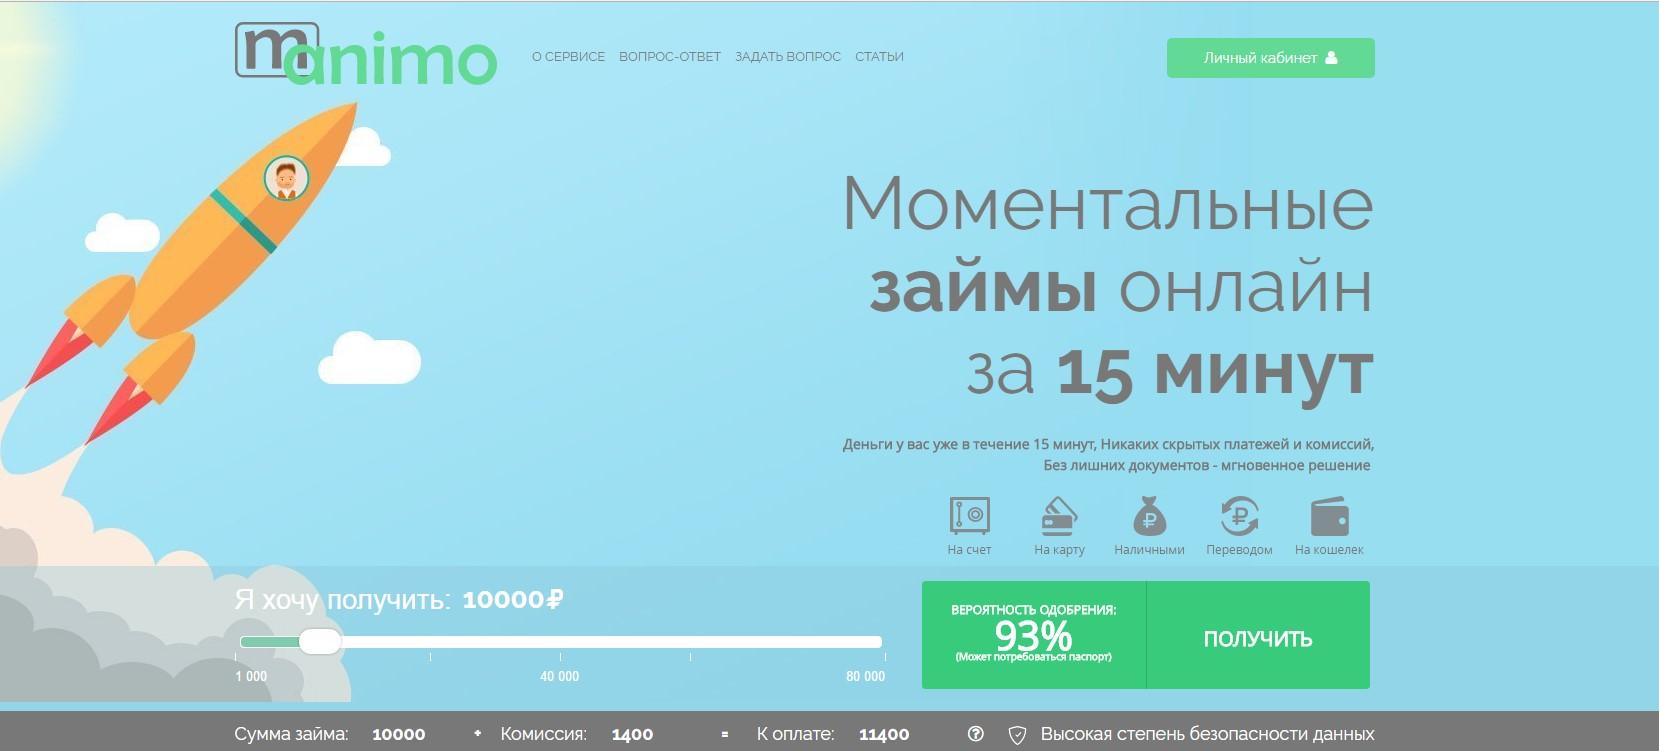 Сайт агрегатор